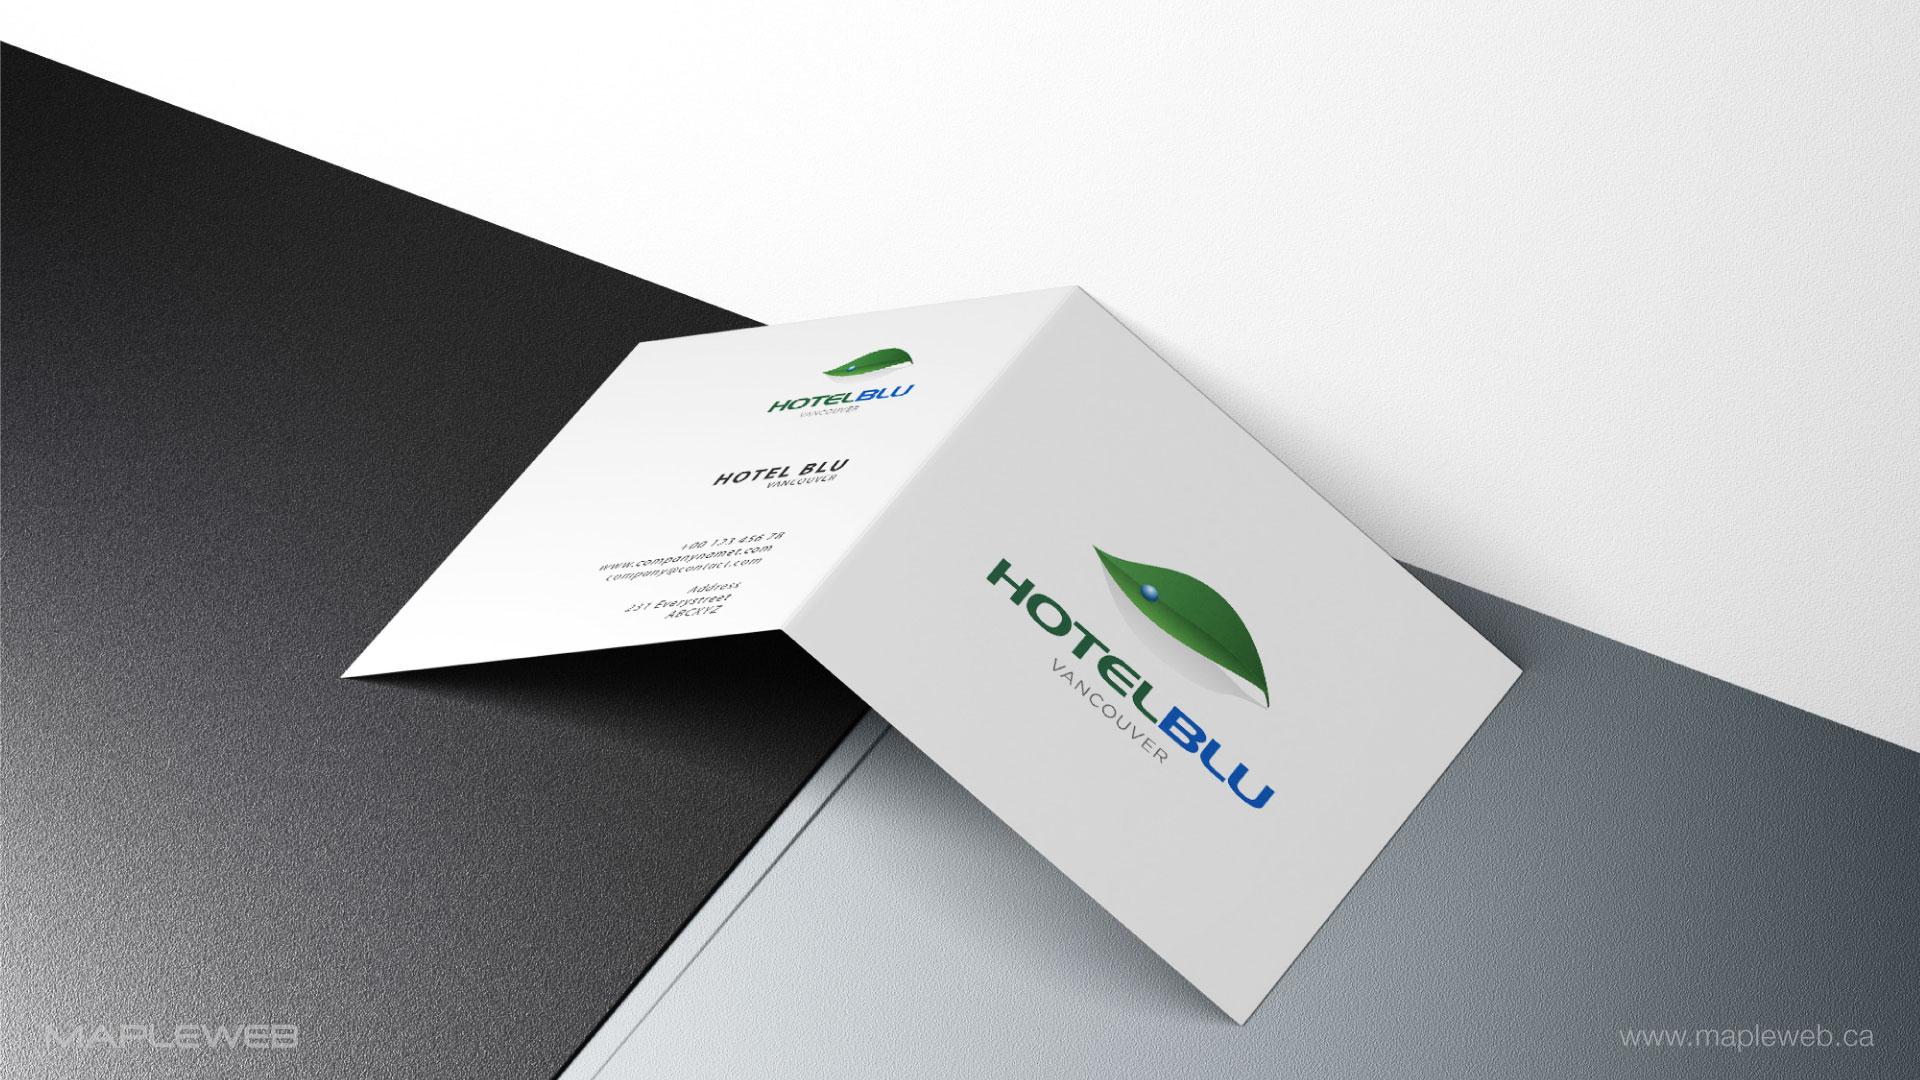 hotel-blu-brand-logo-design-by-mapleweb-vancouver-canada-flip-card-mock